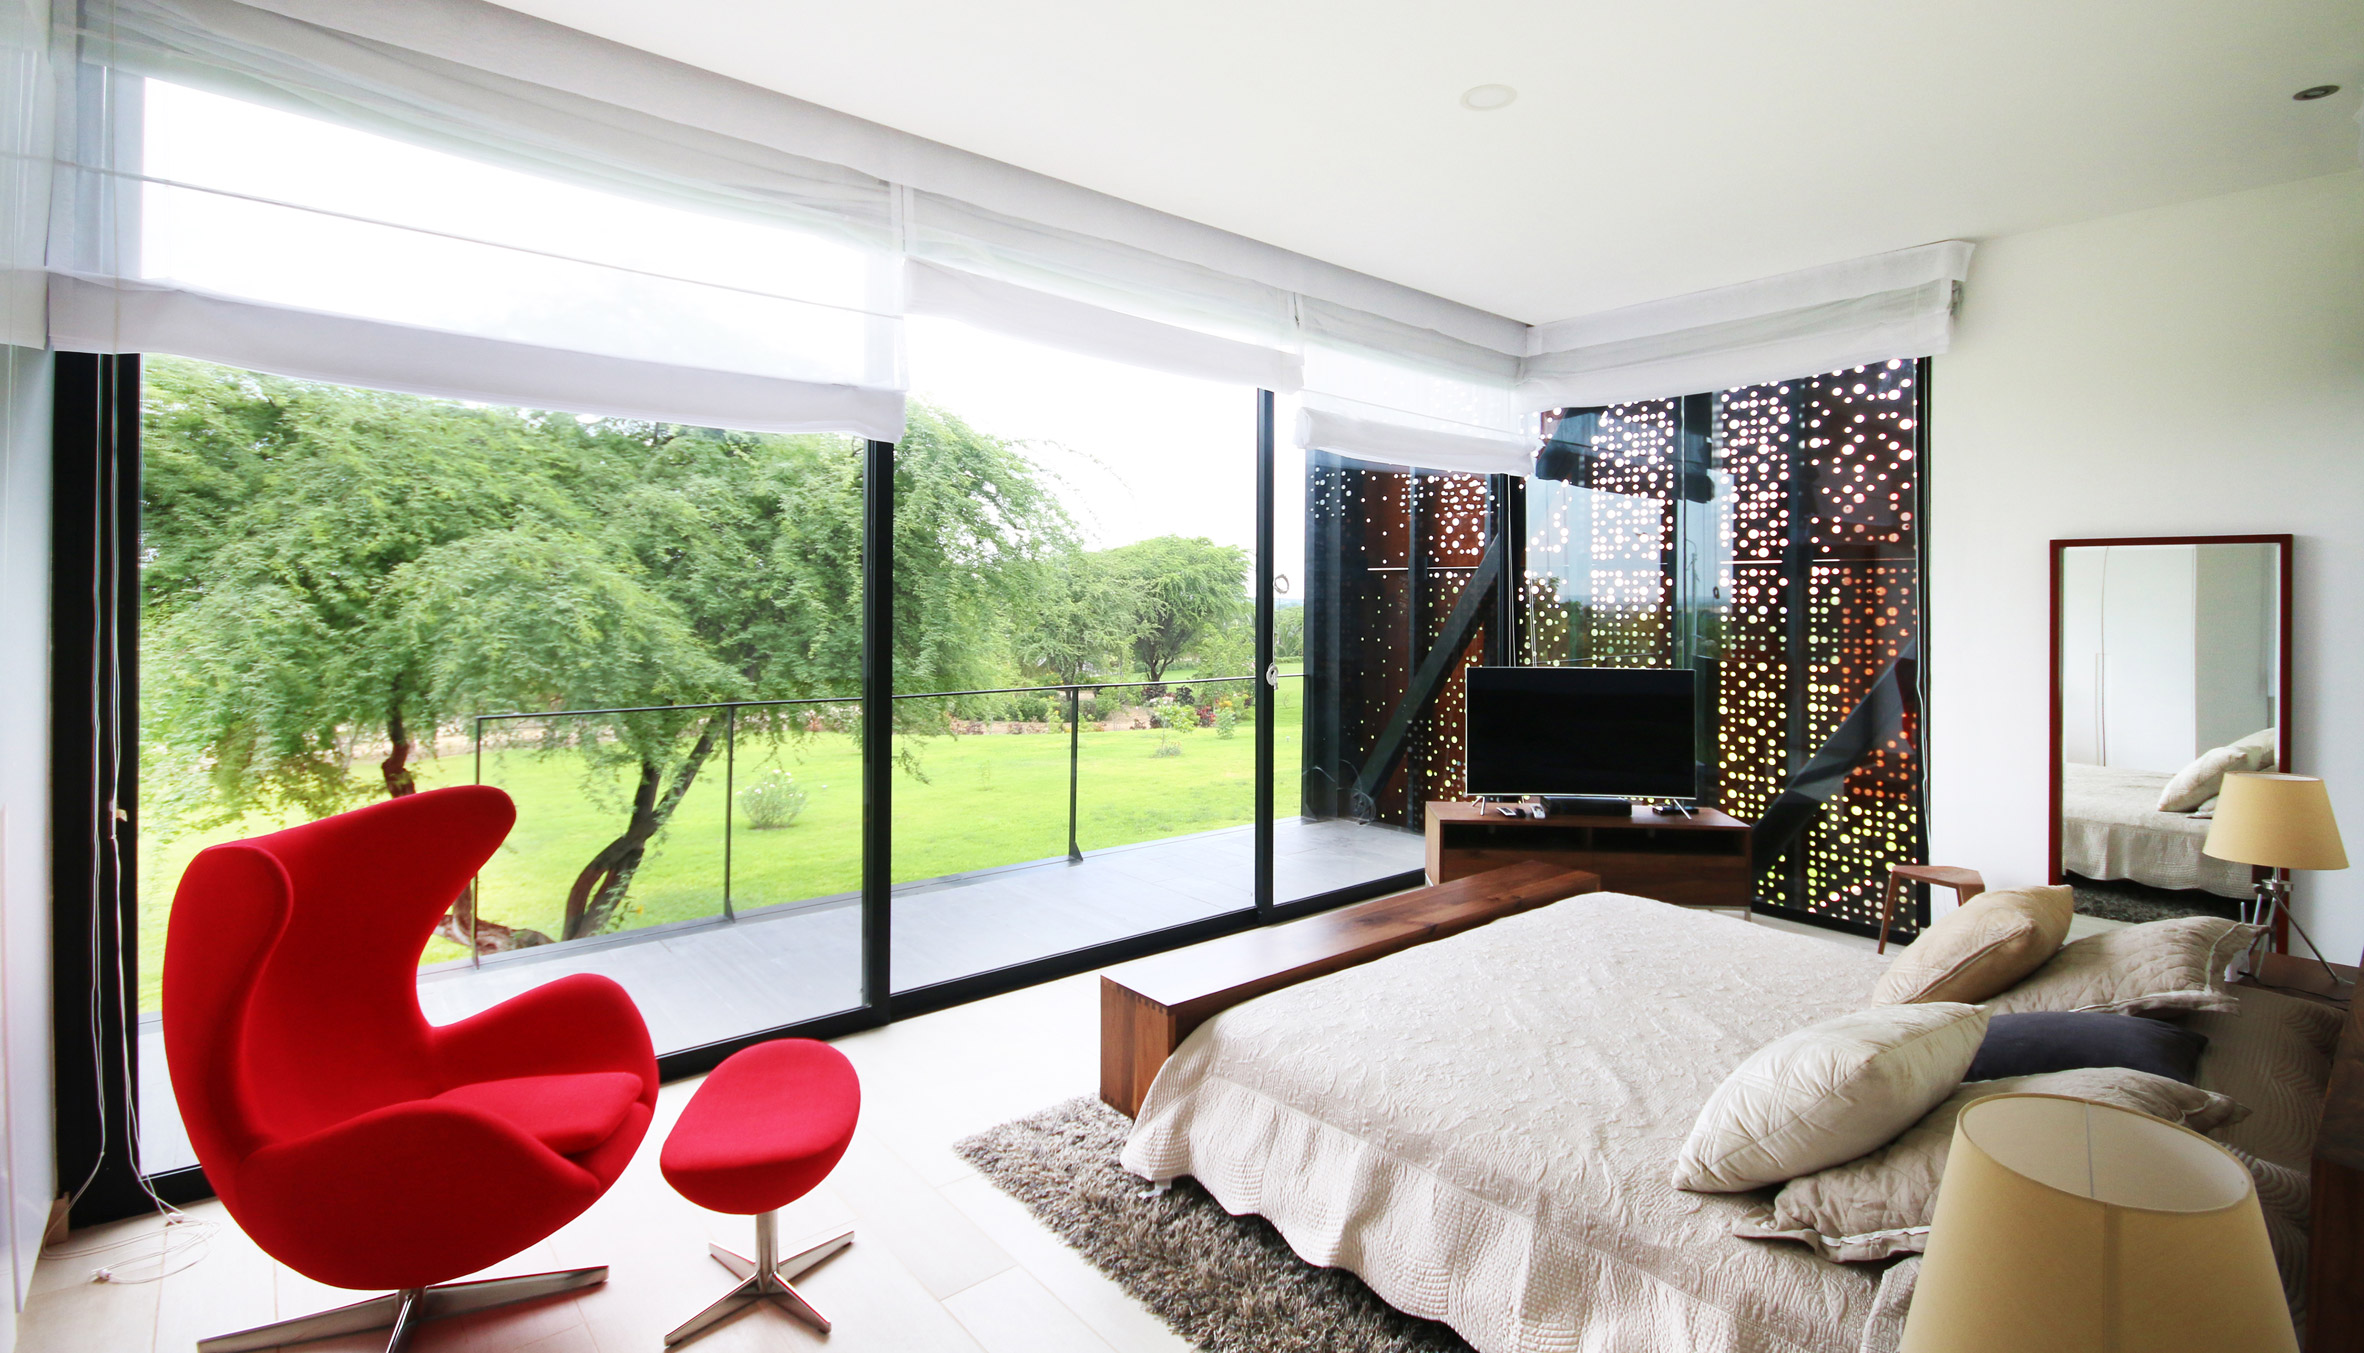 Casa N, Peru by Cheng Franco Architects